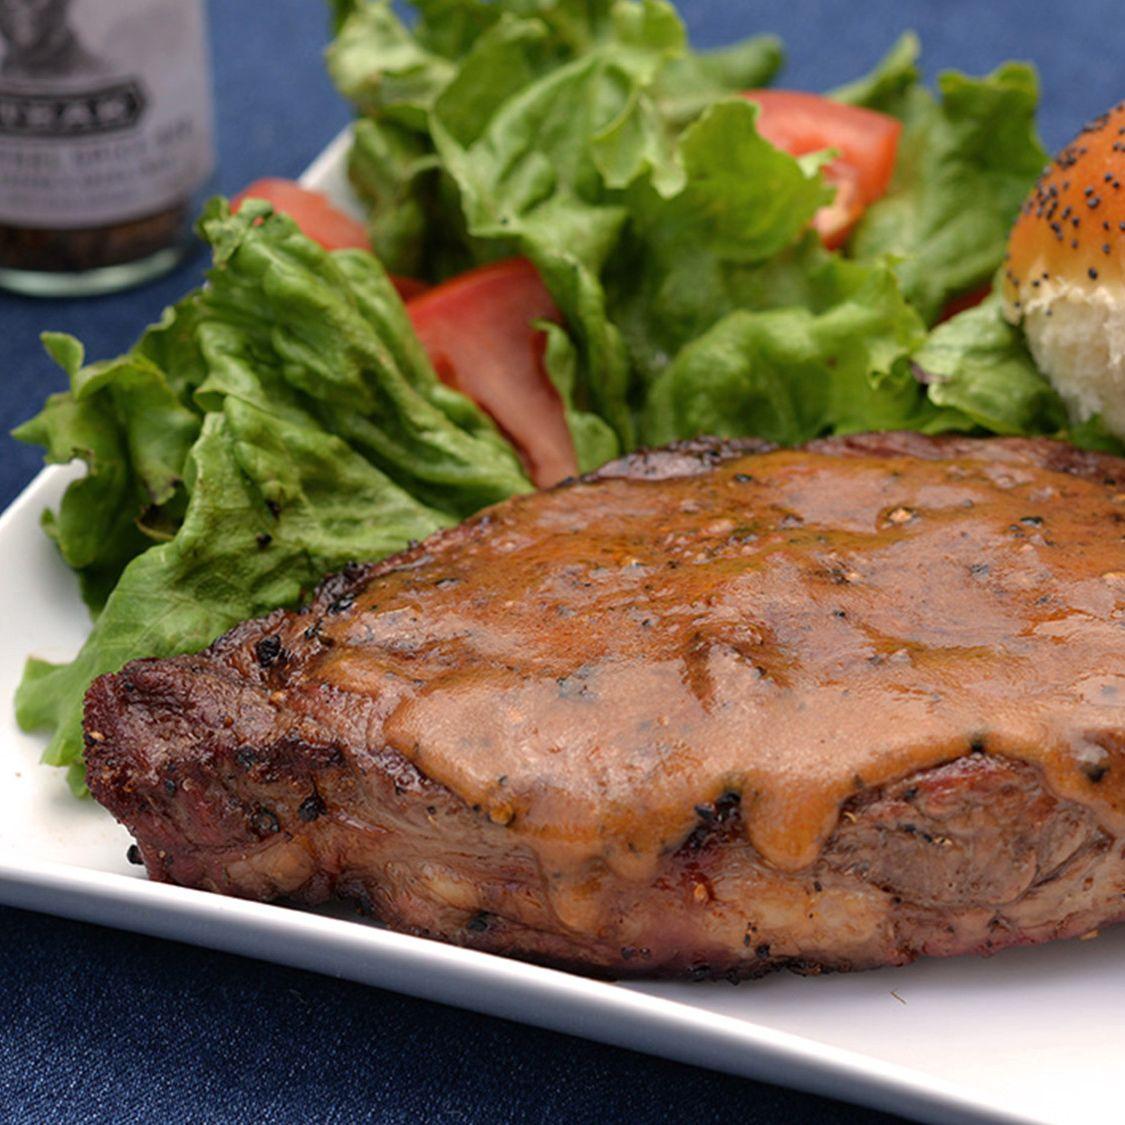 ribeye_steaks_with_stubbs_butter_wing_sauce.jpg